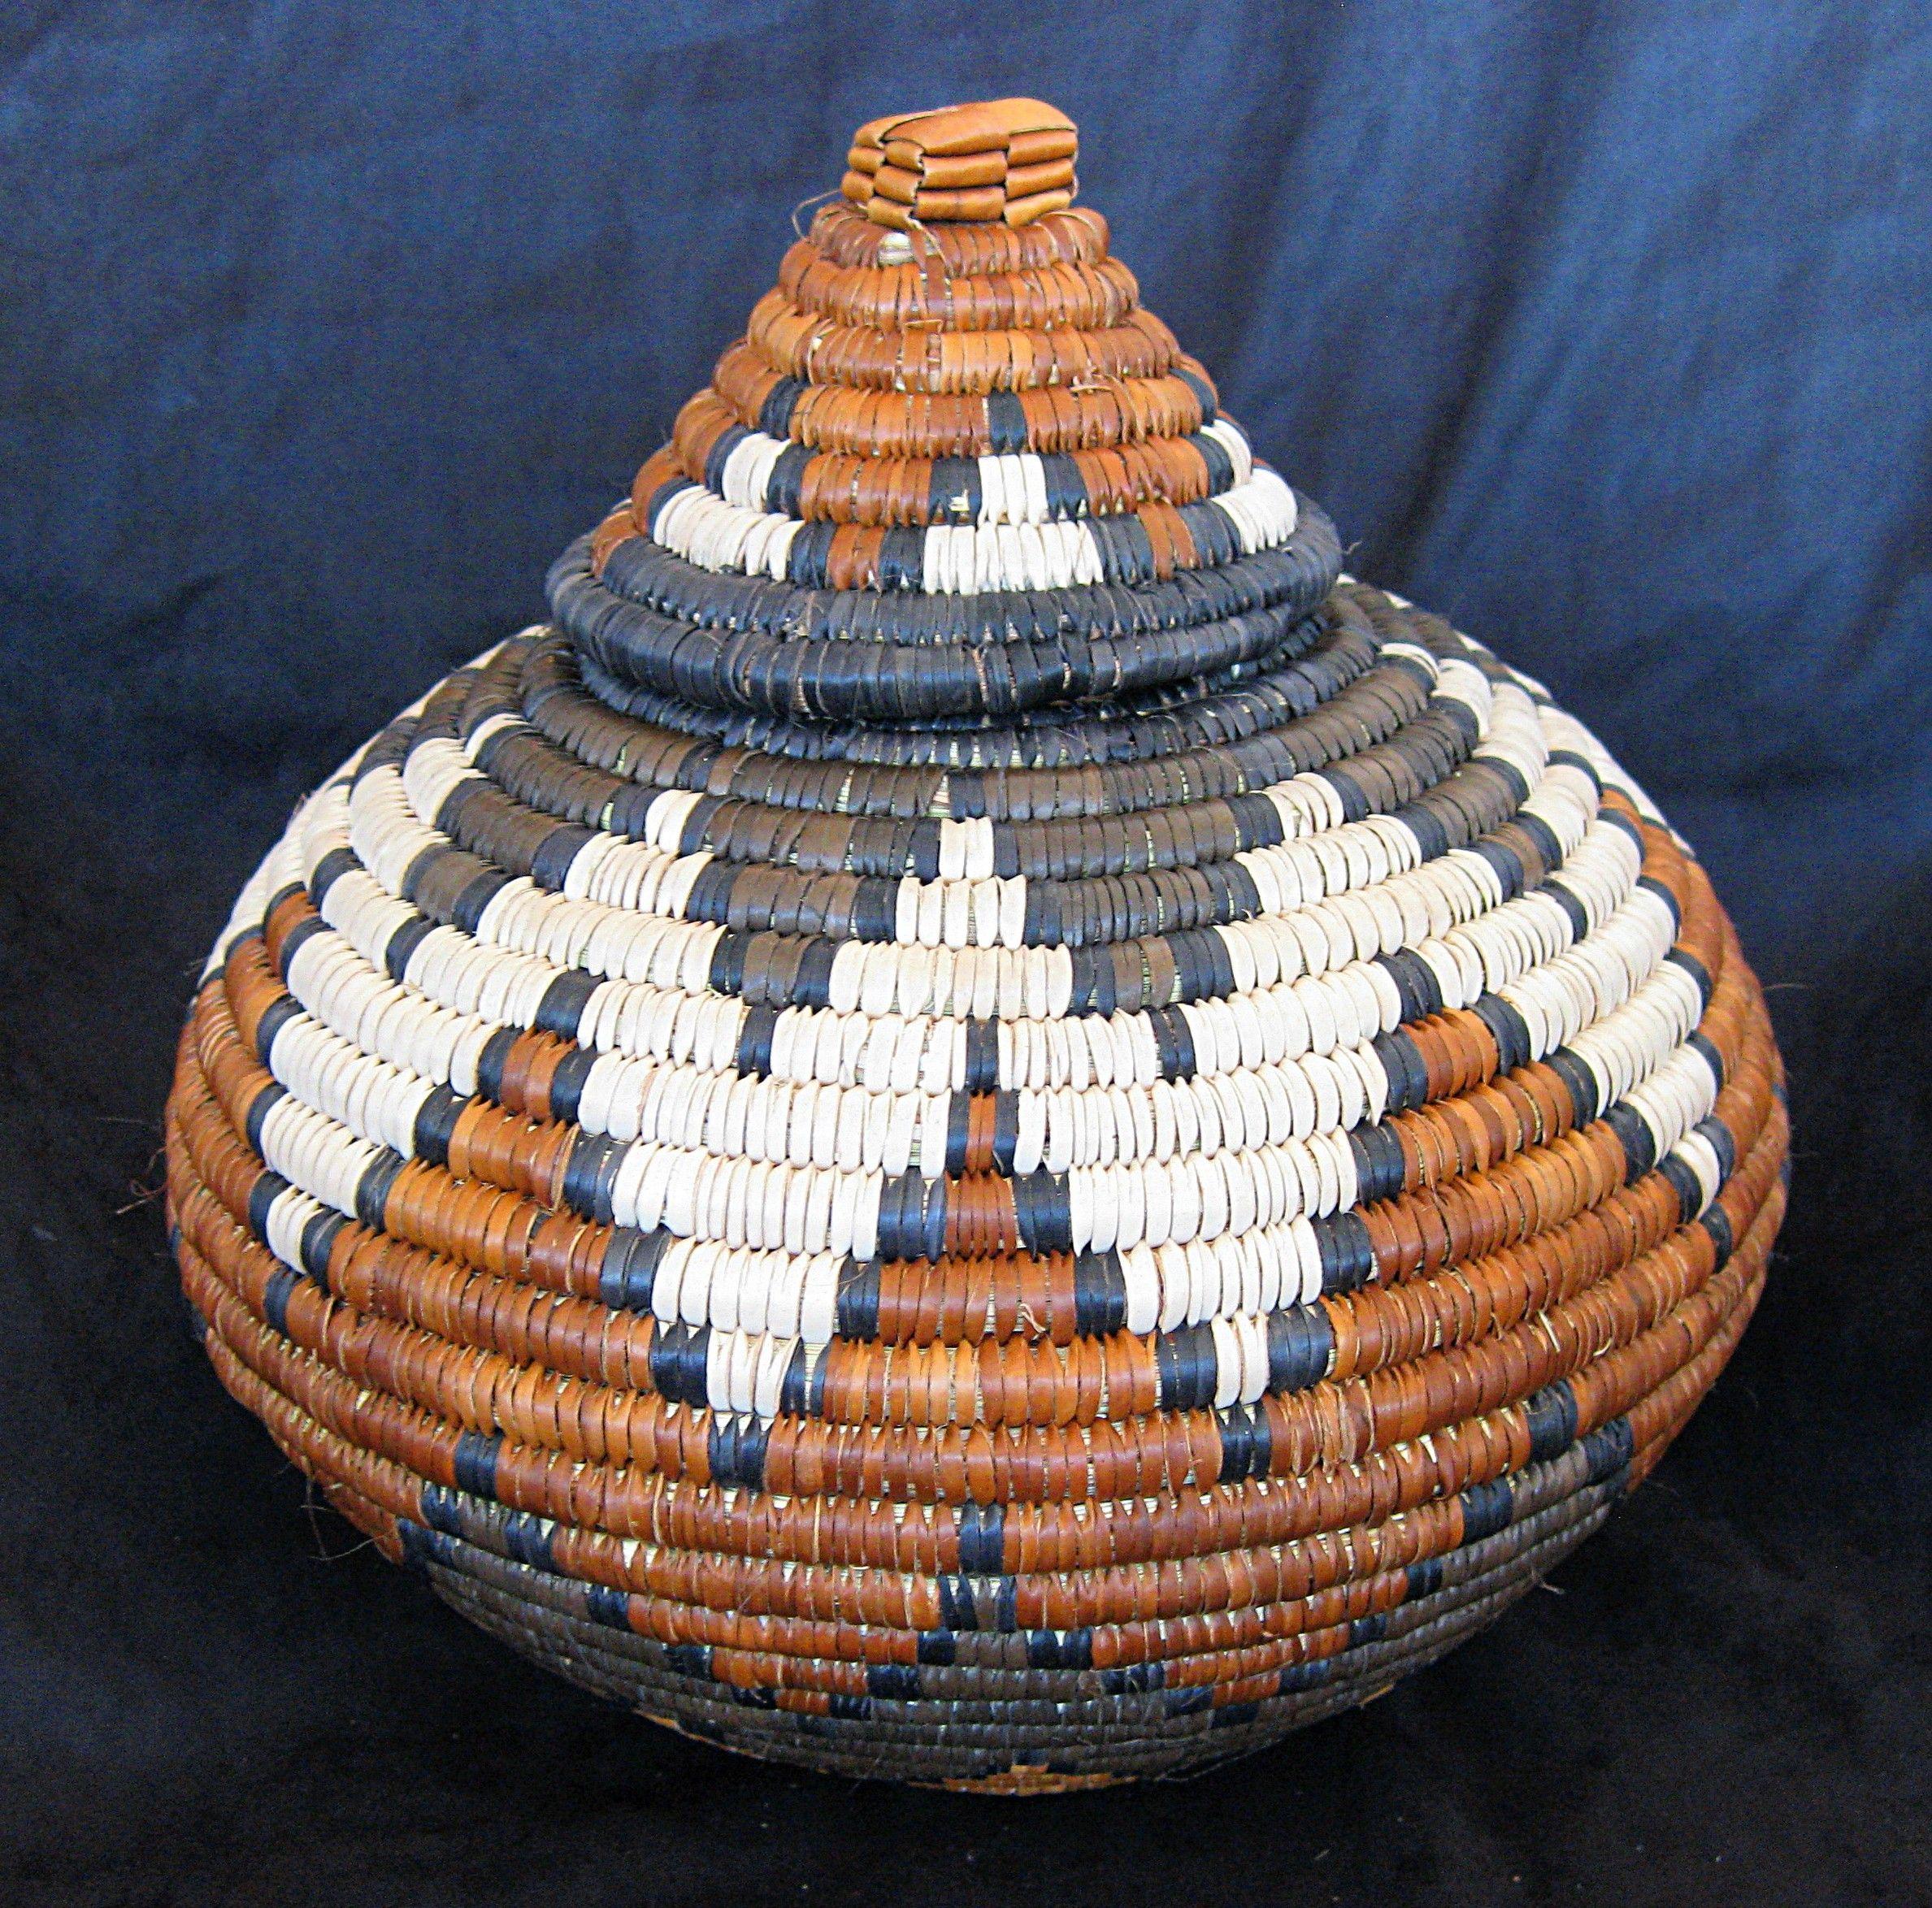 Best African Traditional Basket - d34cfd32ea92d756c984047deac8111a  Image_12320.jpg